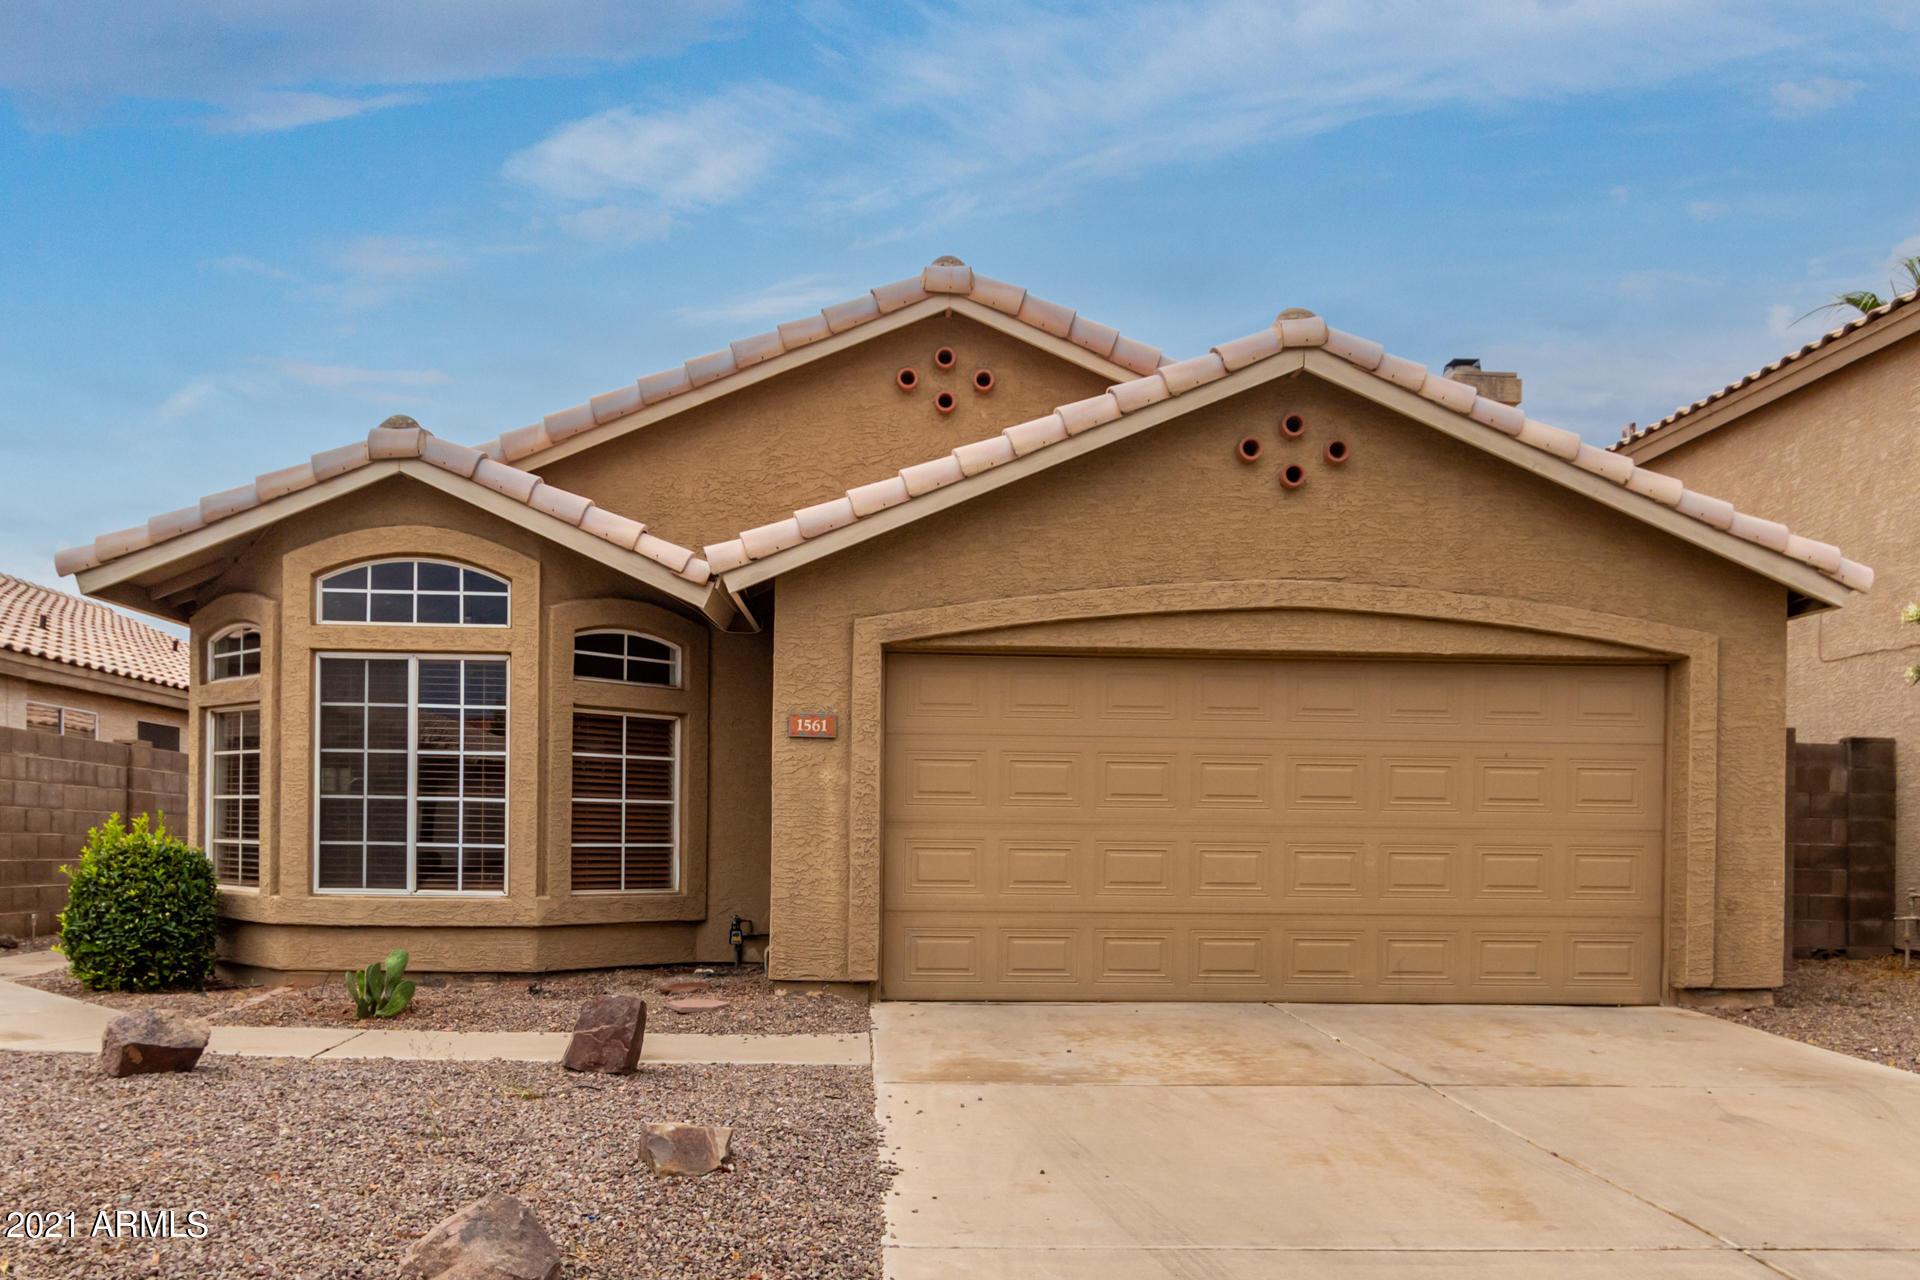 1561 ORCHID Lane, Chandler, Arizona 85224, 3 Bedrooms Bedrooms, ,2 BathroomsBathrooms,Residential Rental,For Rent,ORCHID,6255408